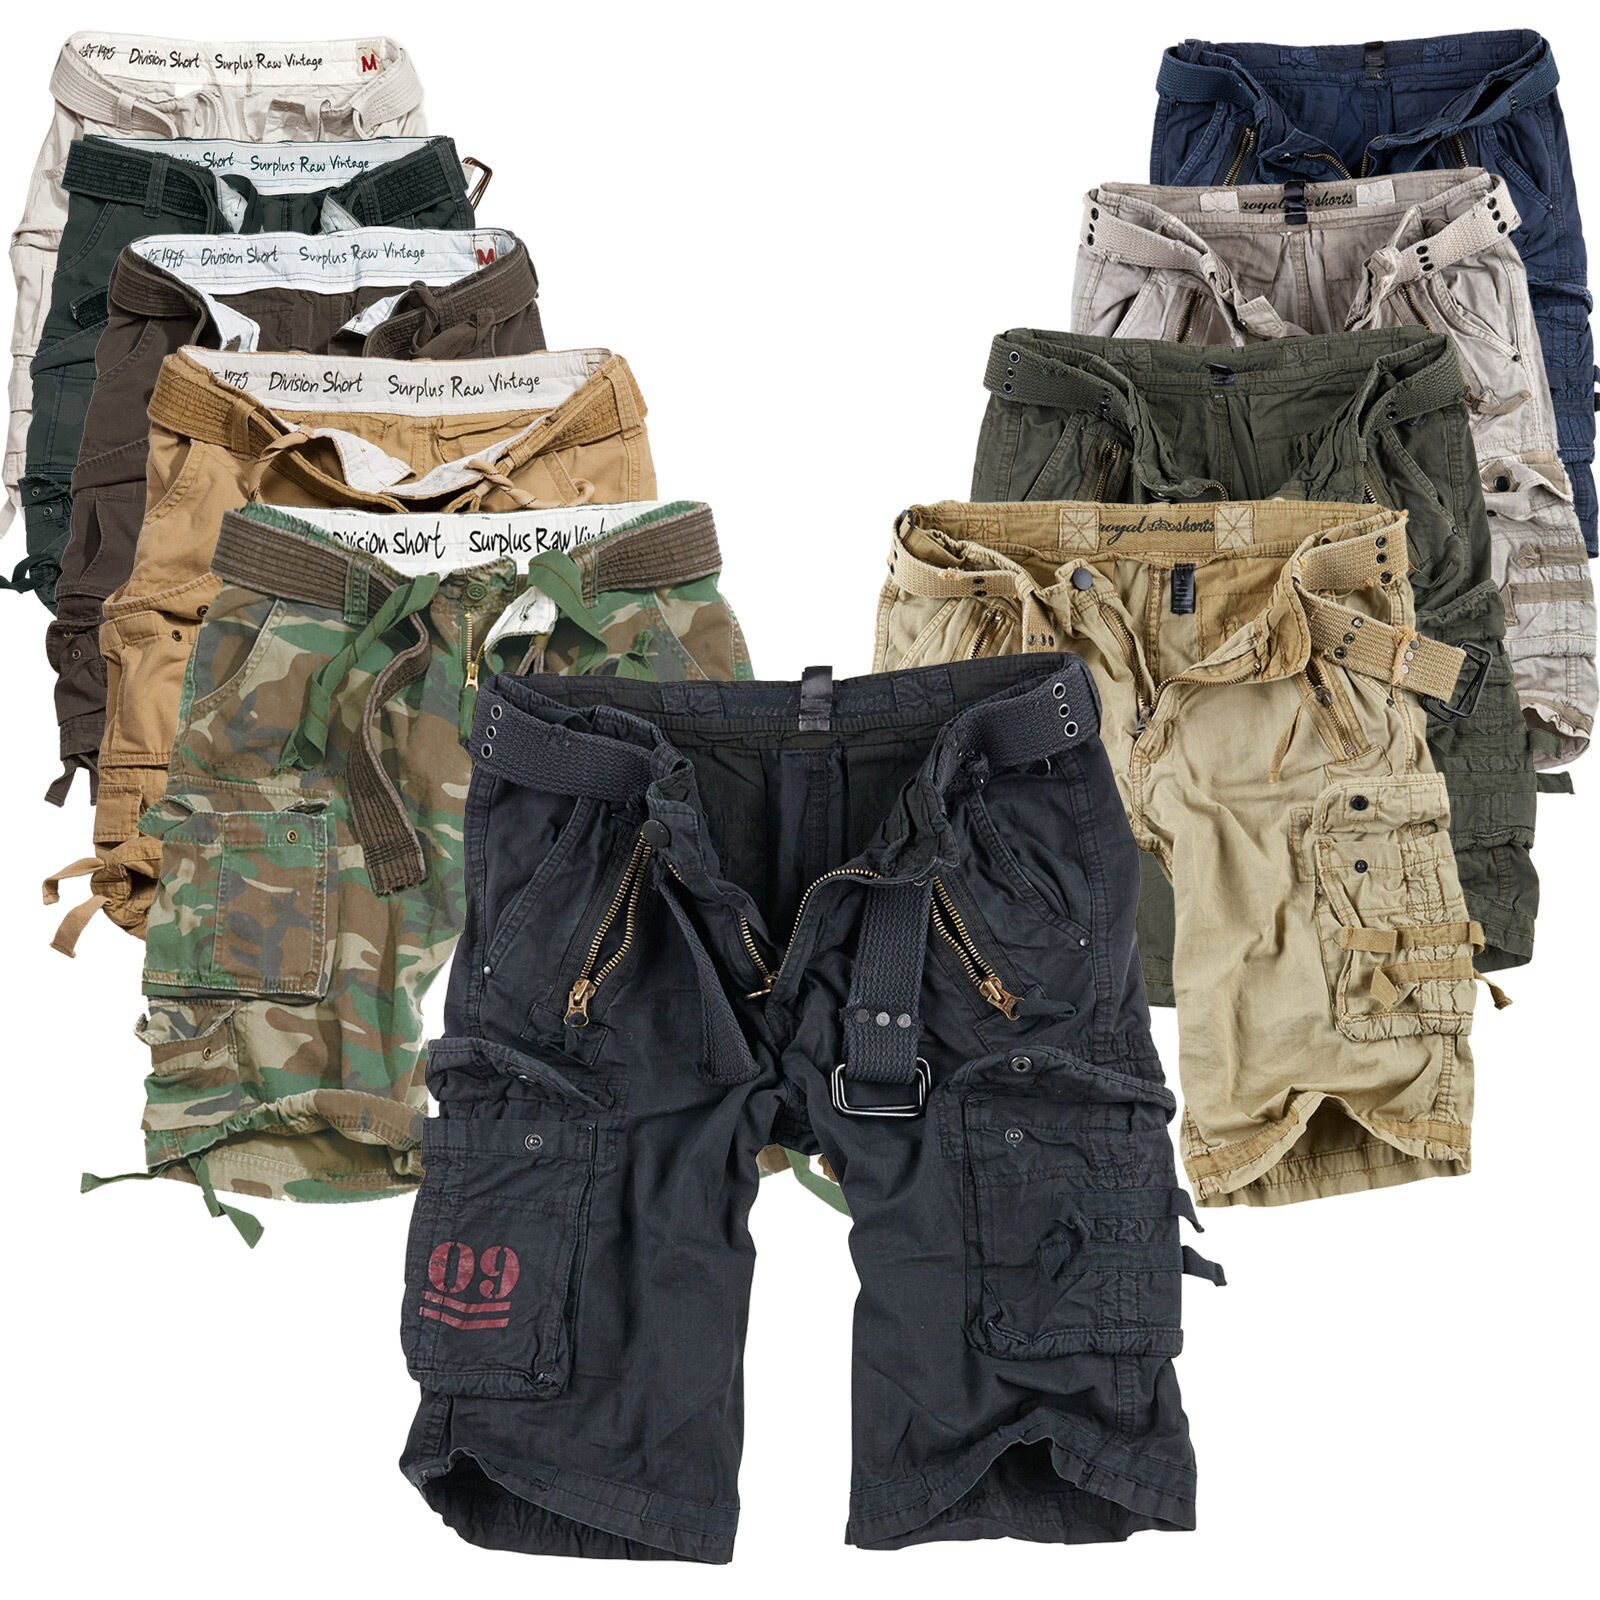 d77a339f297 Surplus Raw Vintage Division Royal Cargo Shorts Bermuda Us Army Shorts